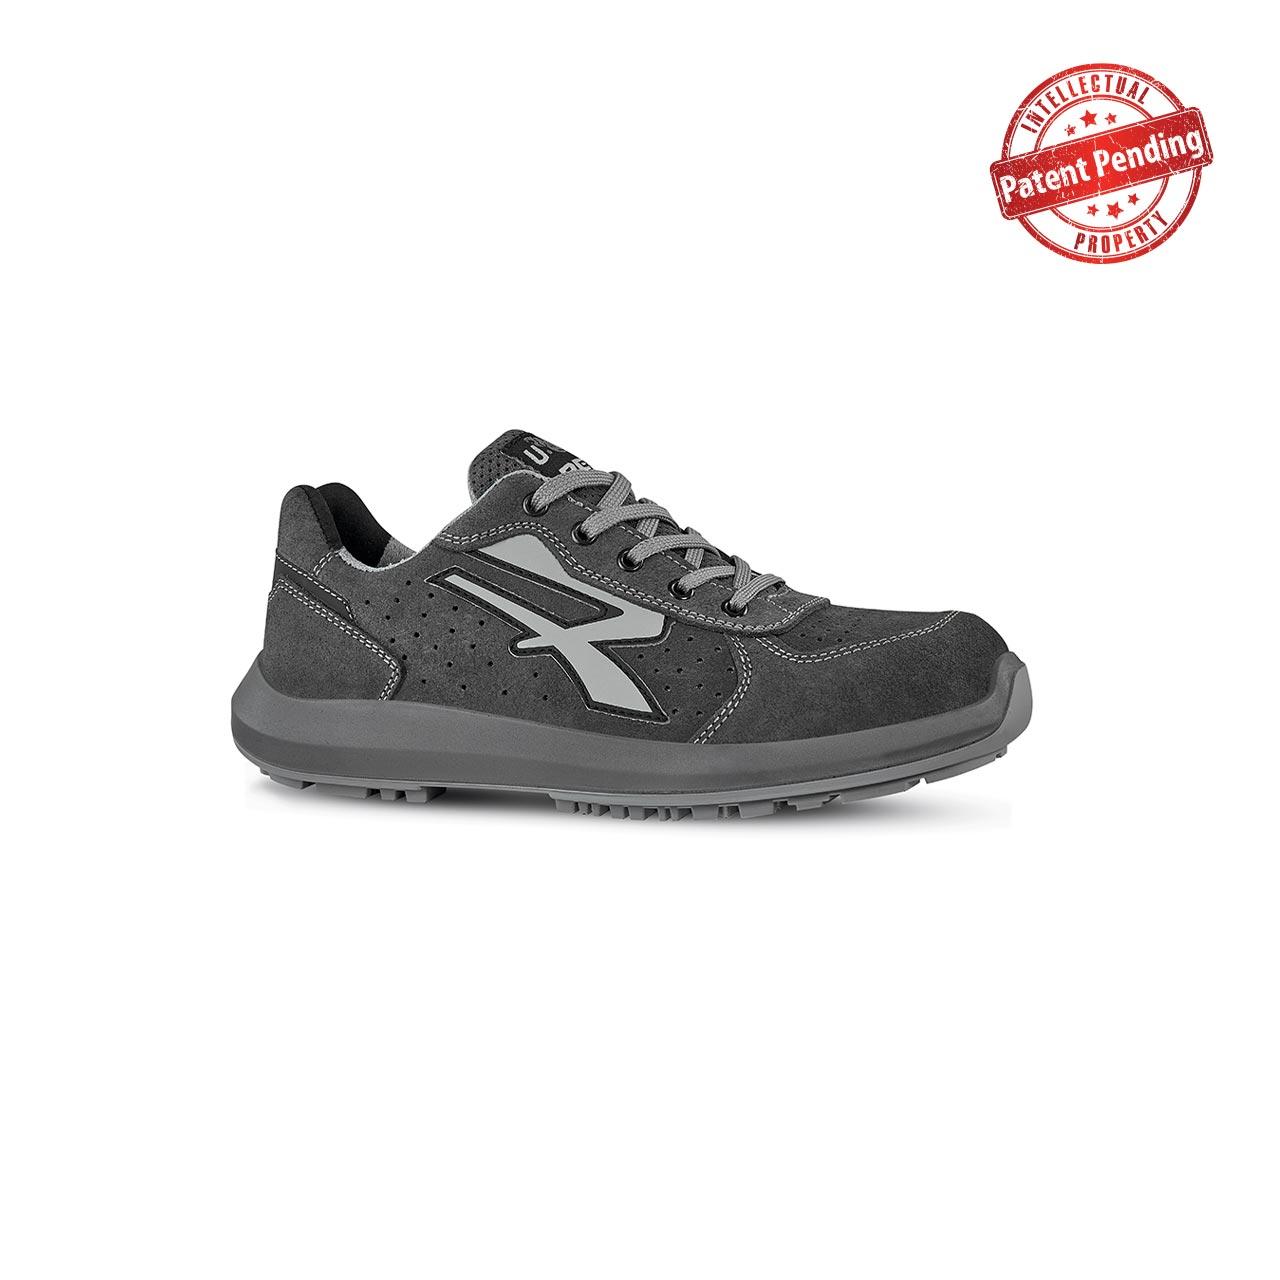 scarpa antinfortunistica upower modello rigel linea redup vista laterale